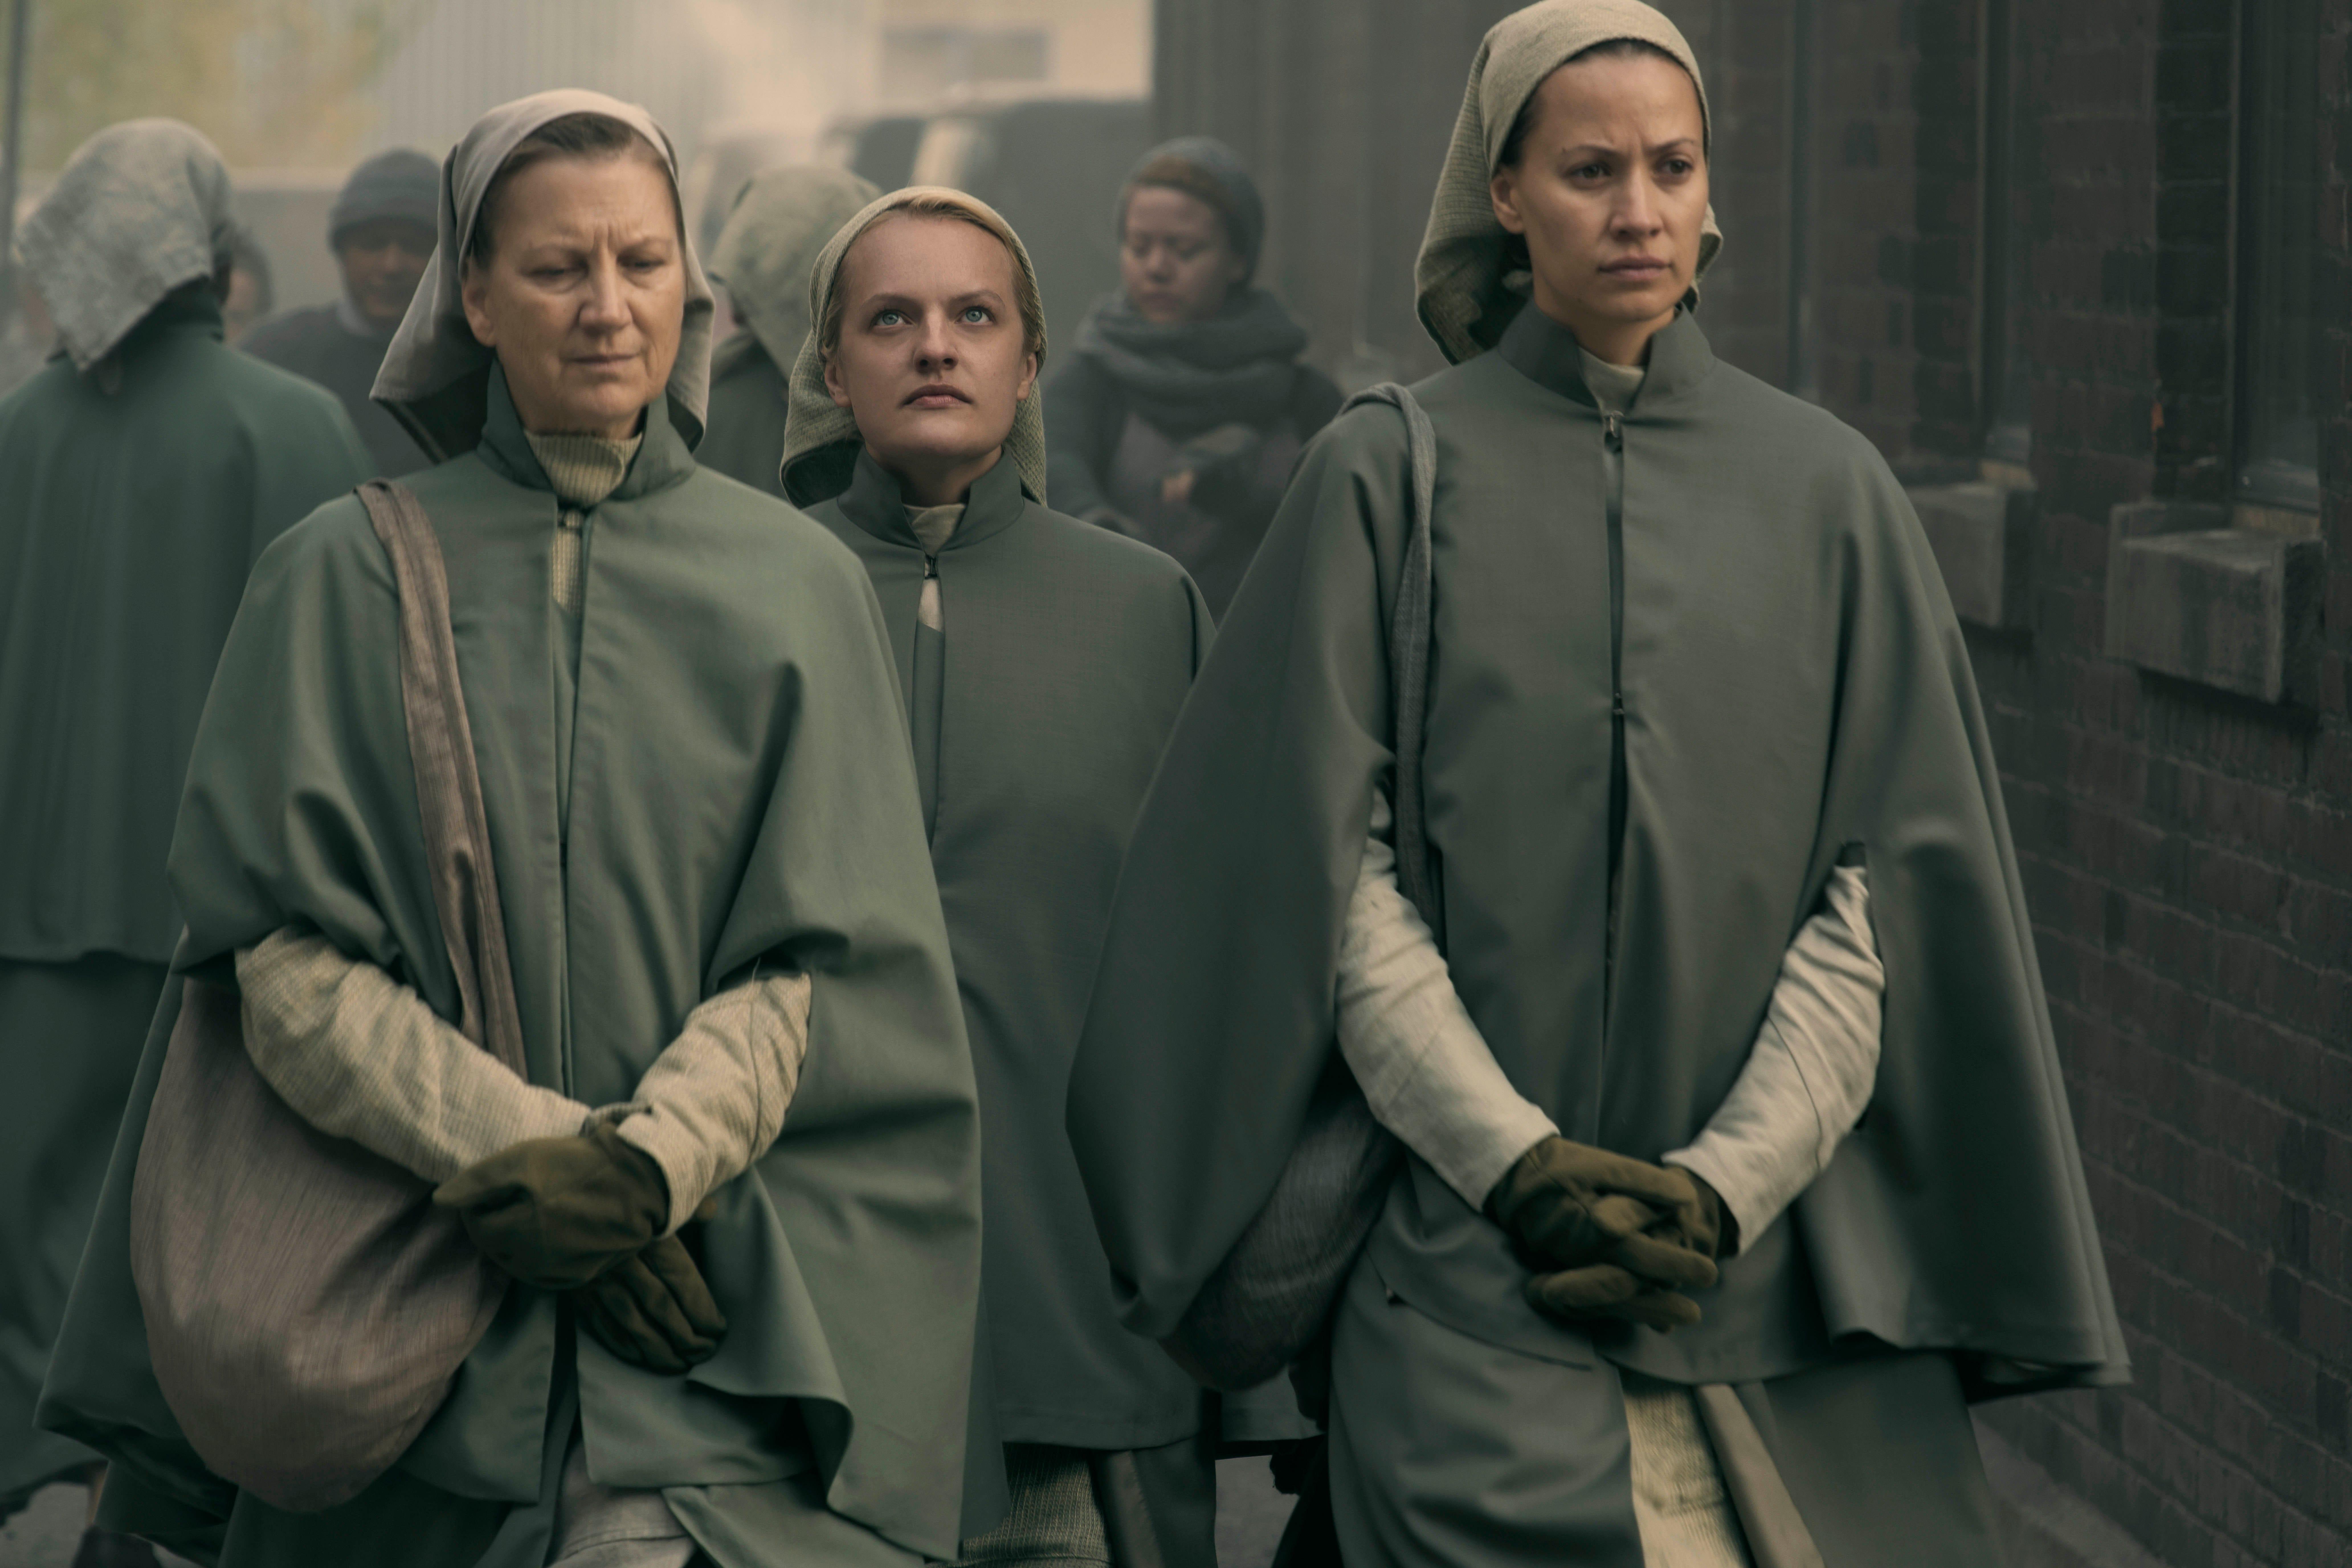 Handmaids Tale Season 3 Episode 2 Recap Mary And Martha